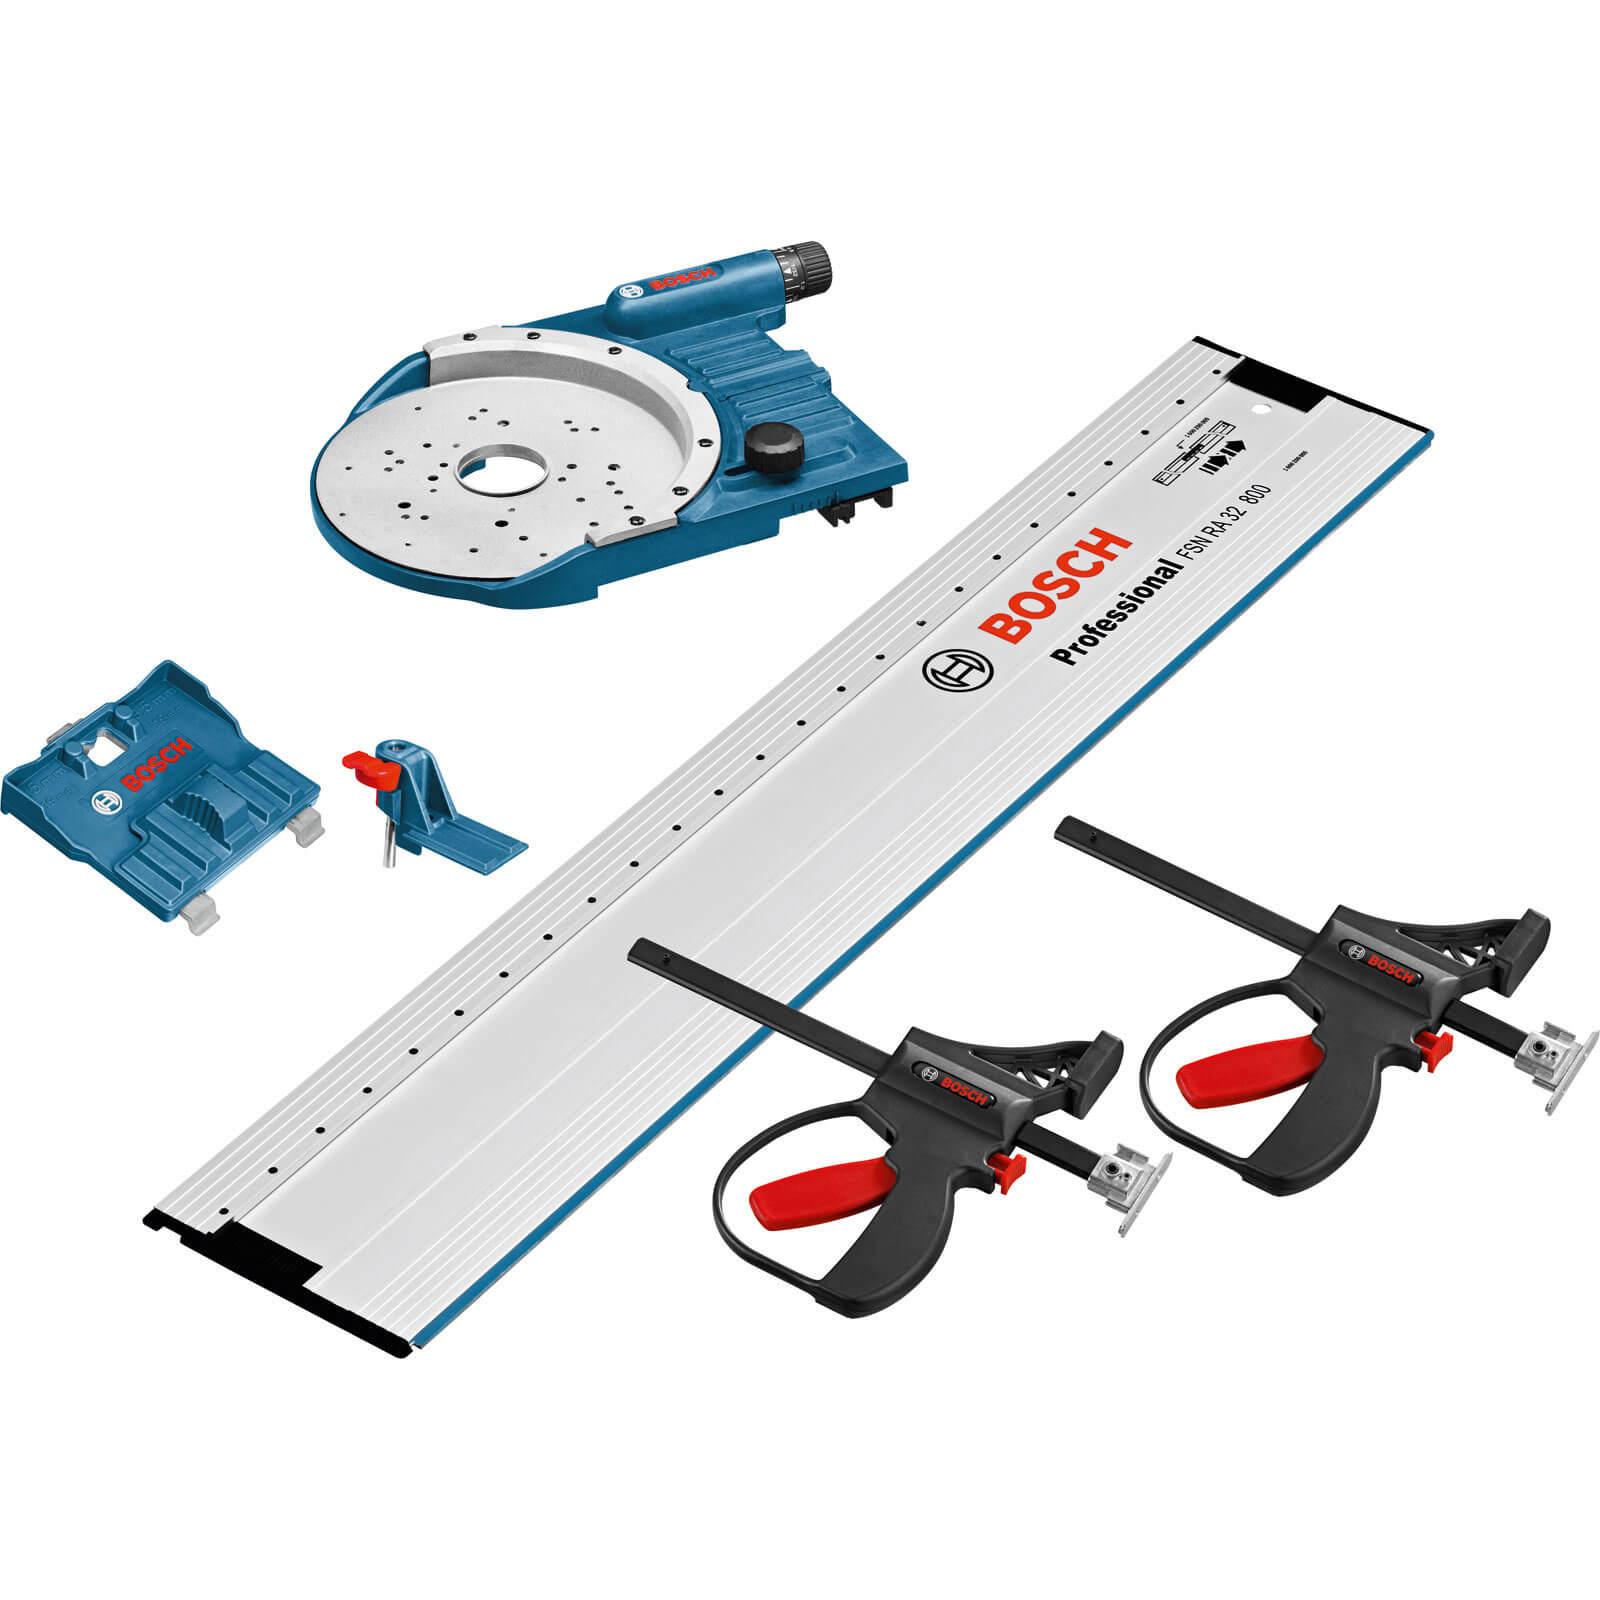 Image of Bosch FSN OFA 32 Complete 5 Piece Guide Rail Kit